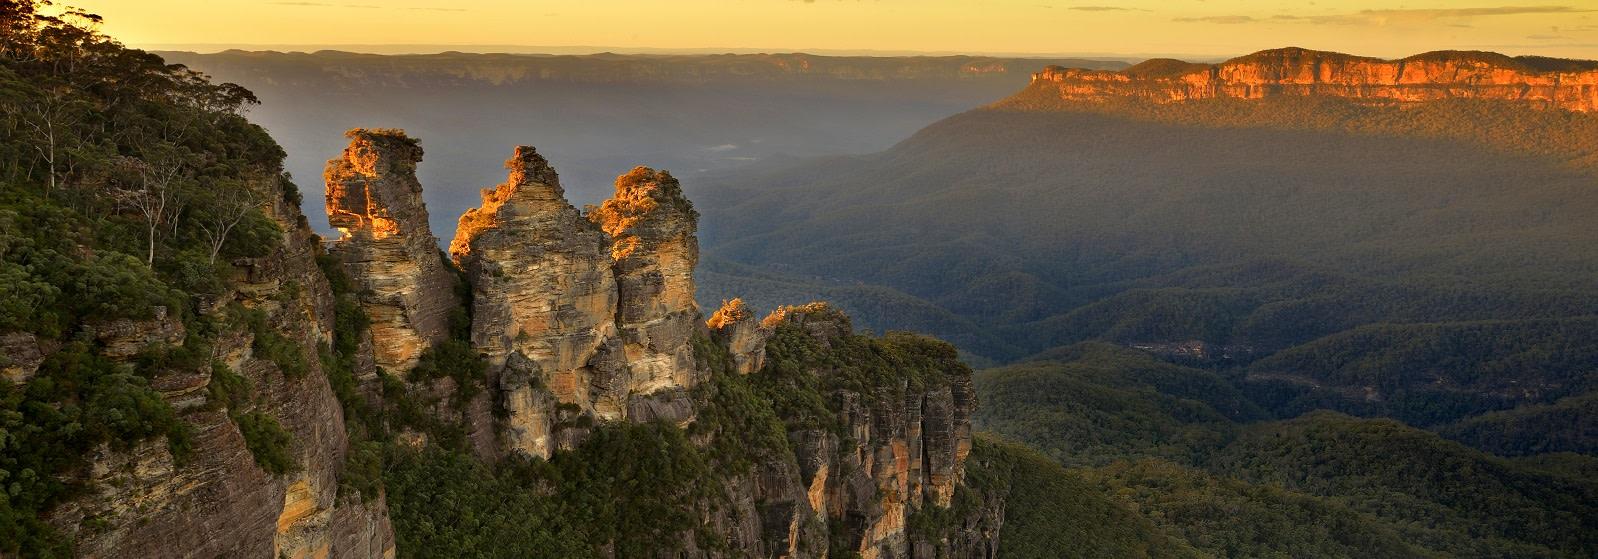 Australia Vacation - The Grampians